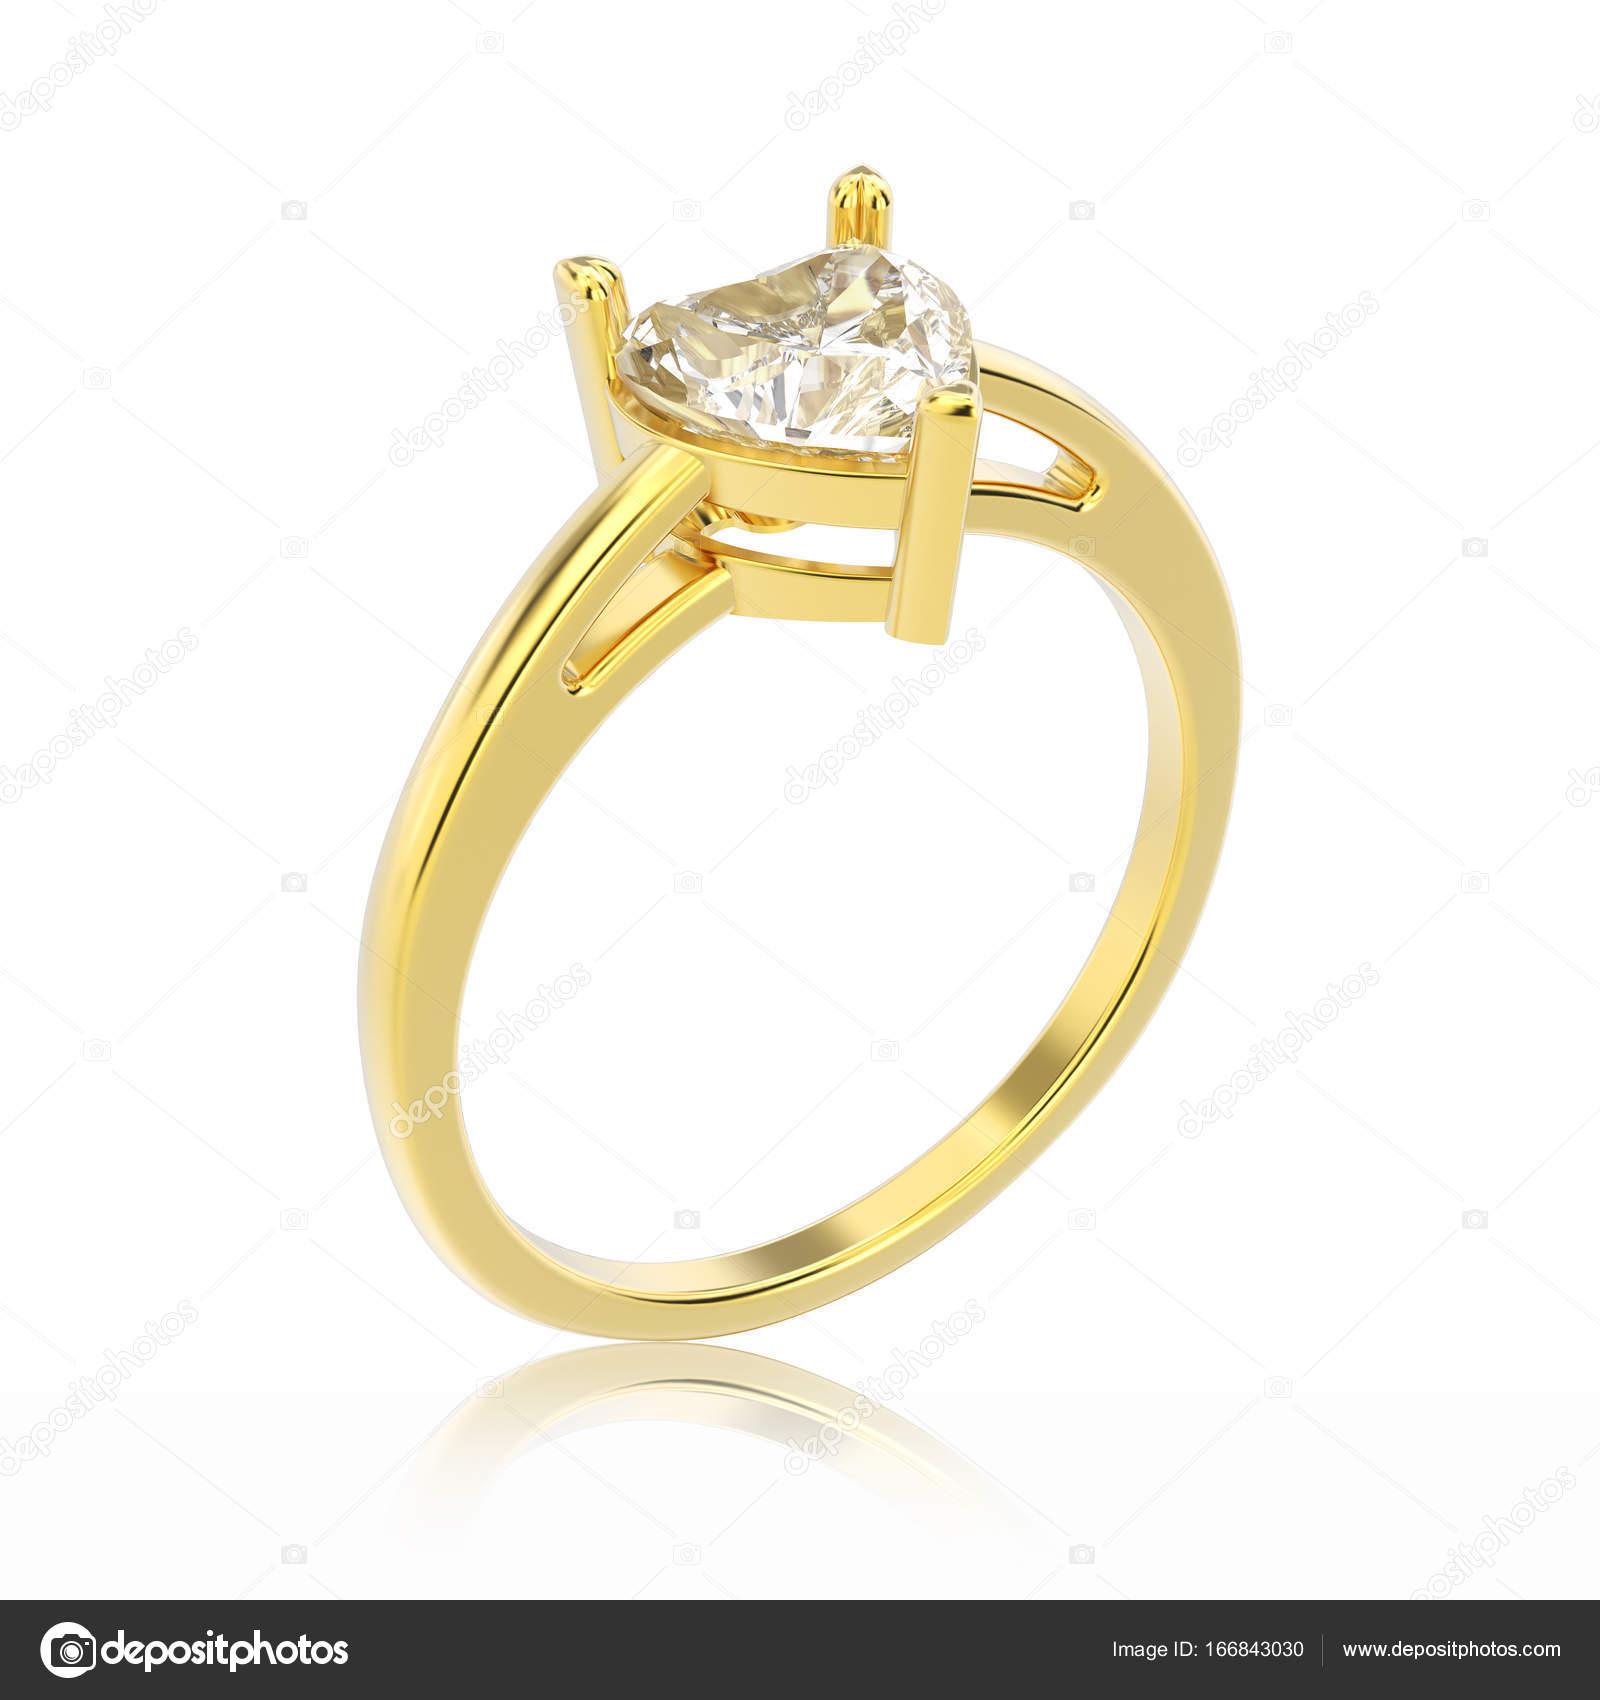 3 D イラスト分離された黄色の金の婚約指輪ダイヤモンドを ストック